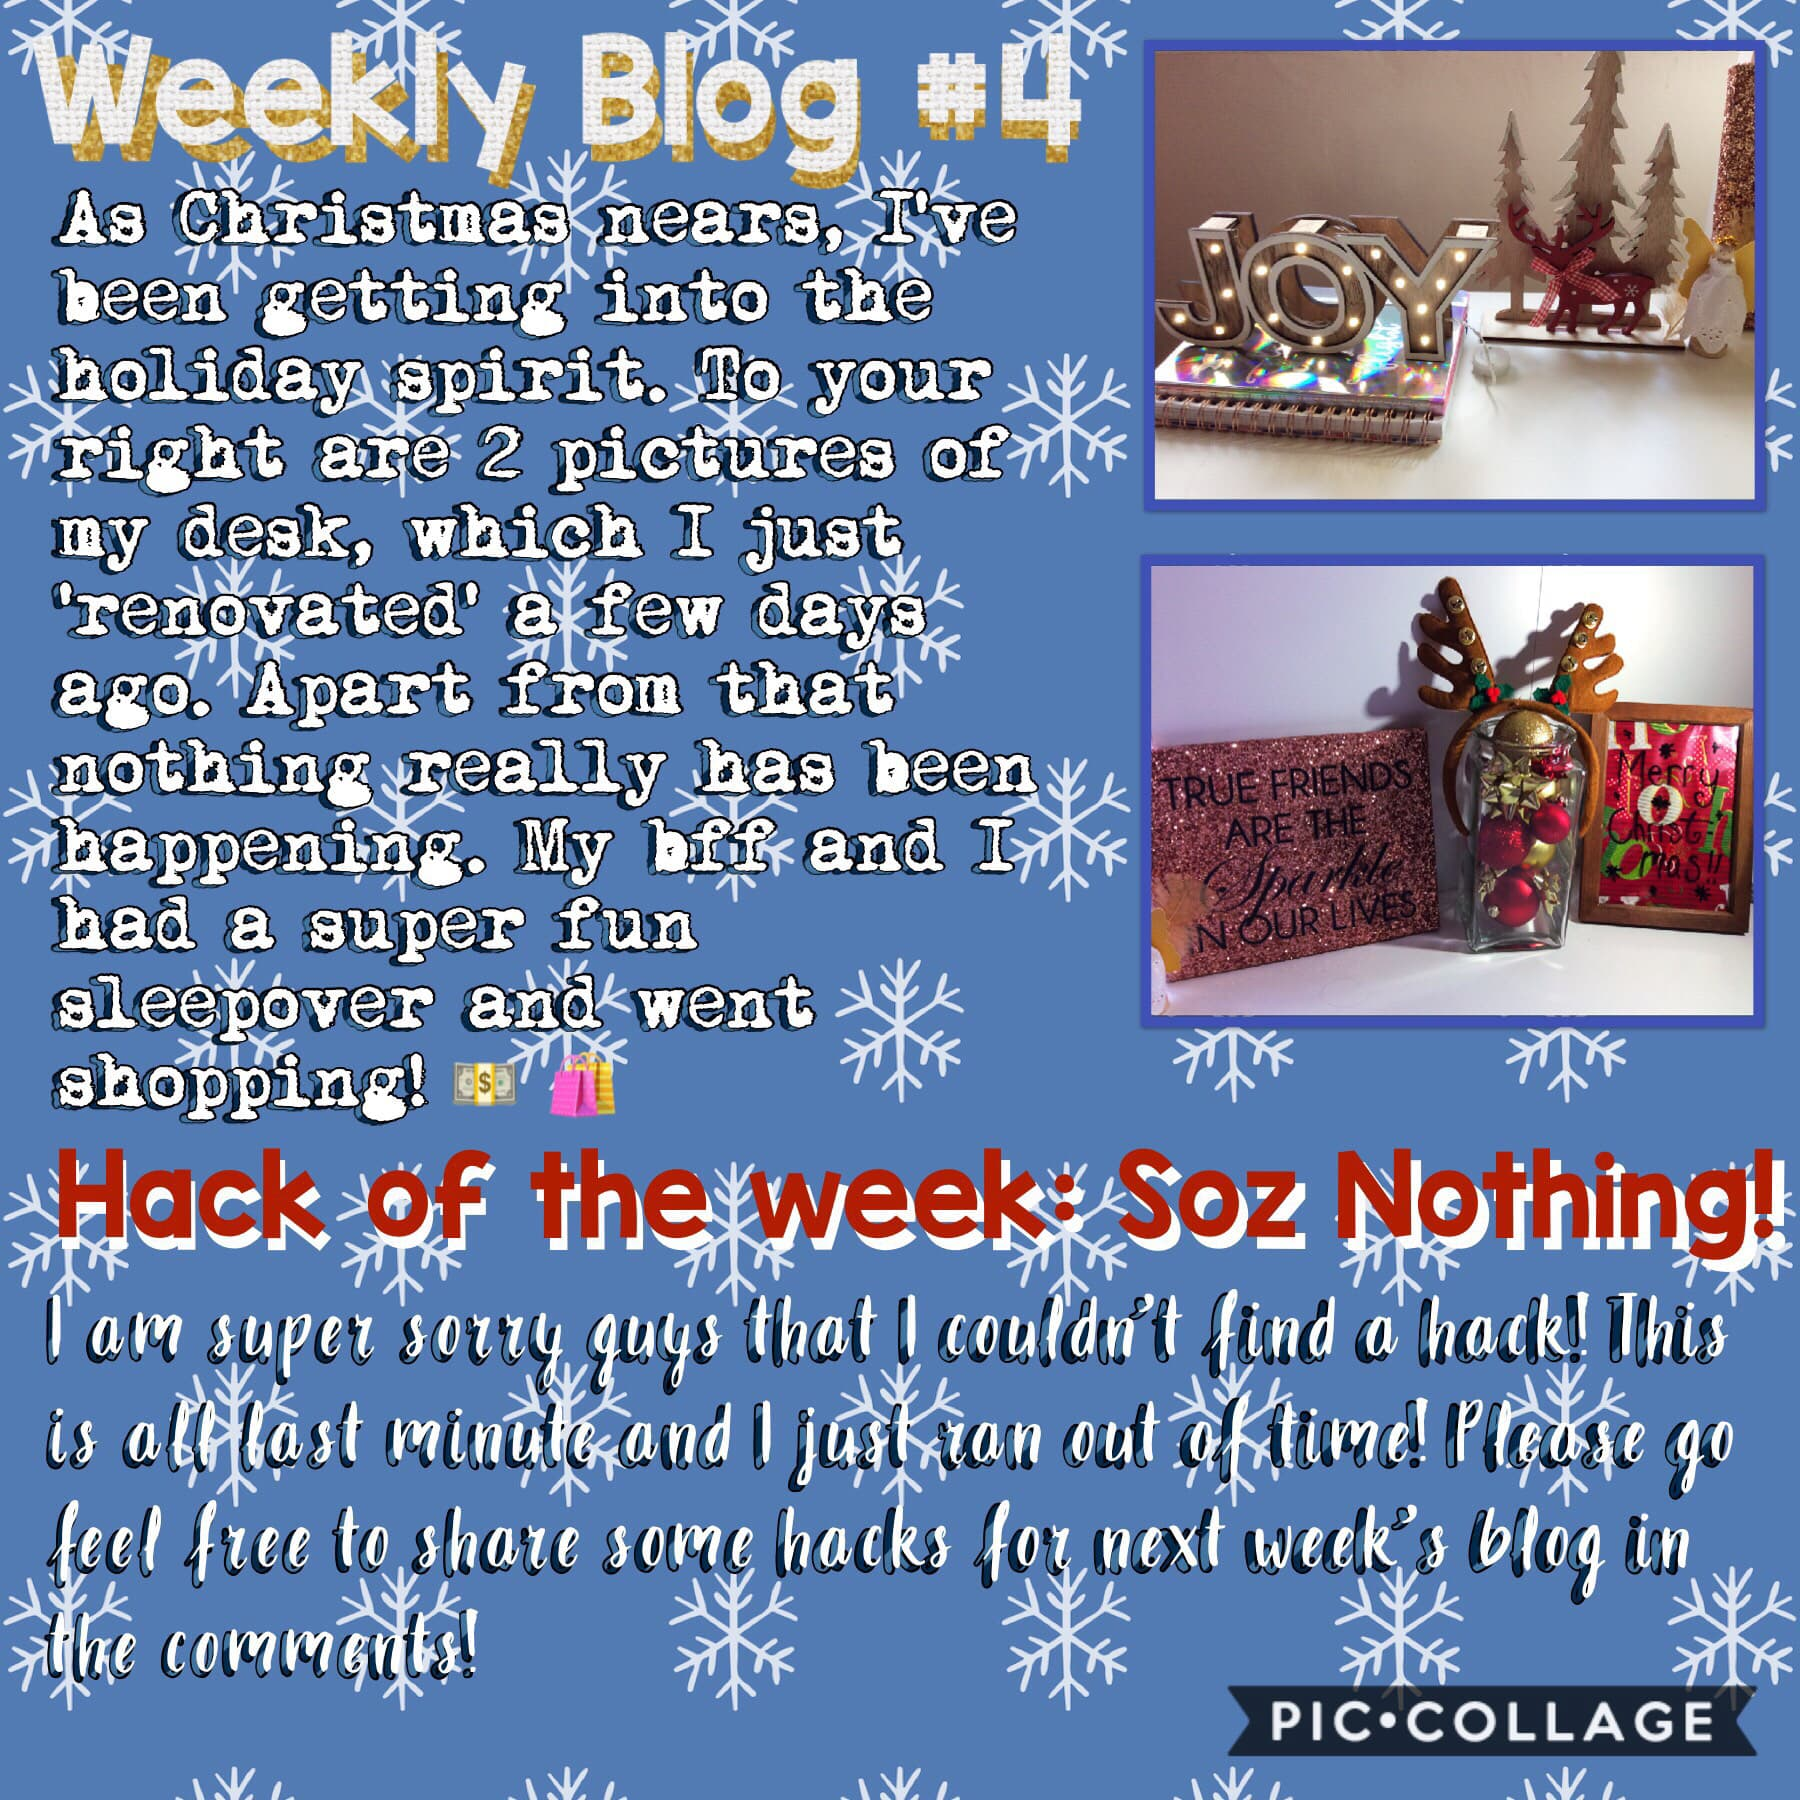 ❄️ Weekly Blog #4! Soz for no hack this week! ❄️  2/12/18